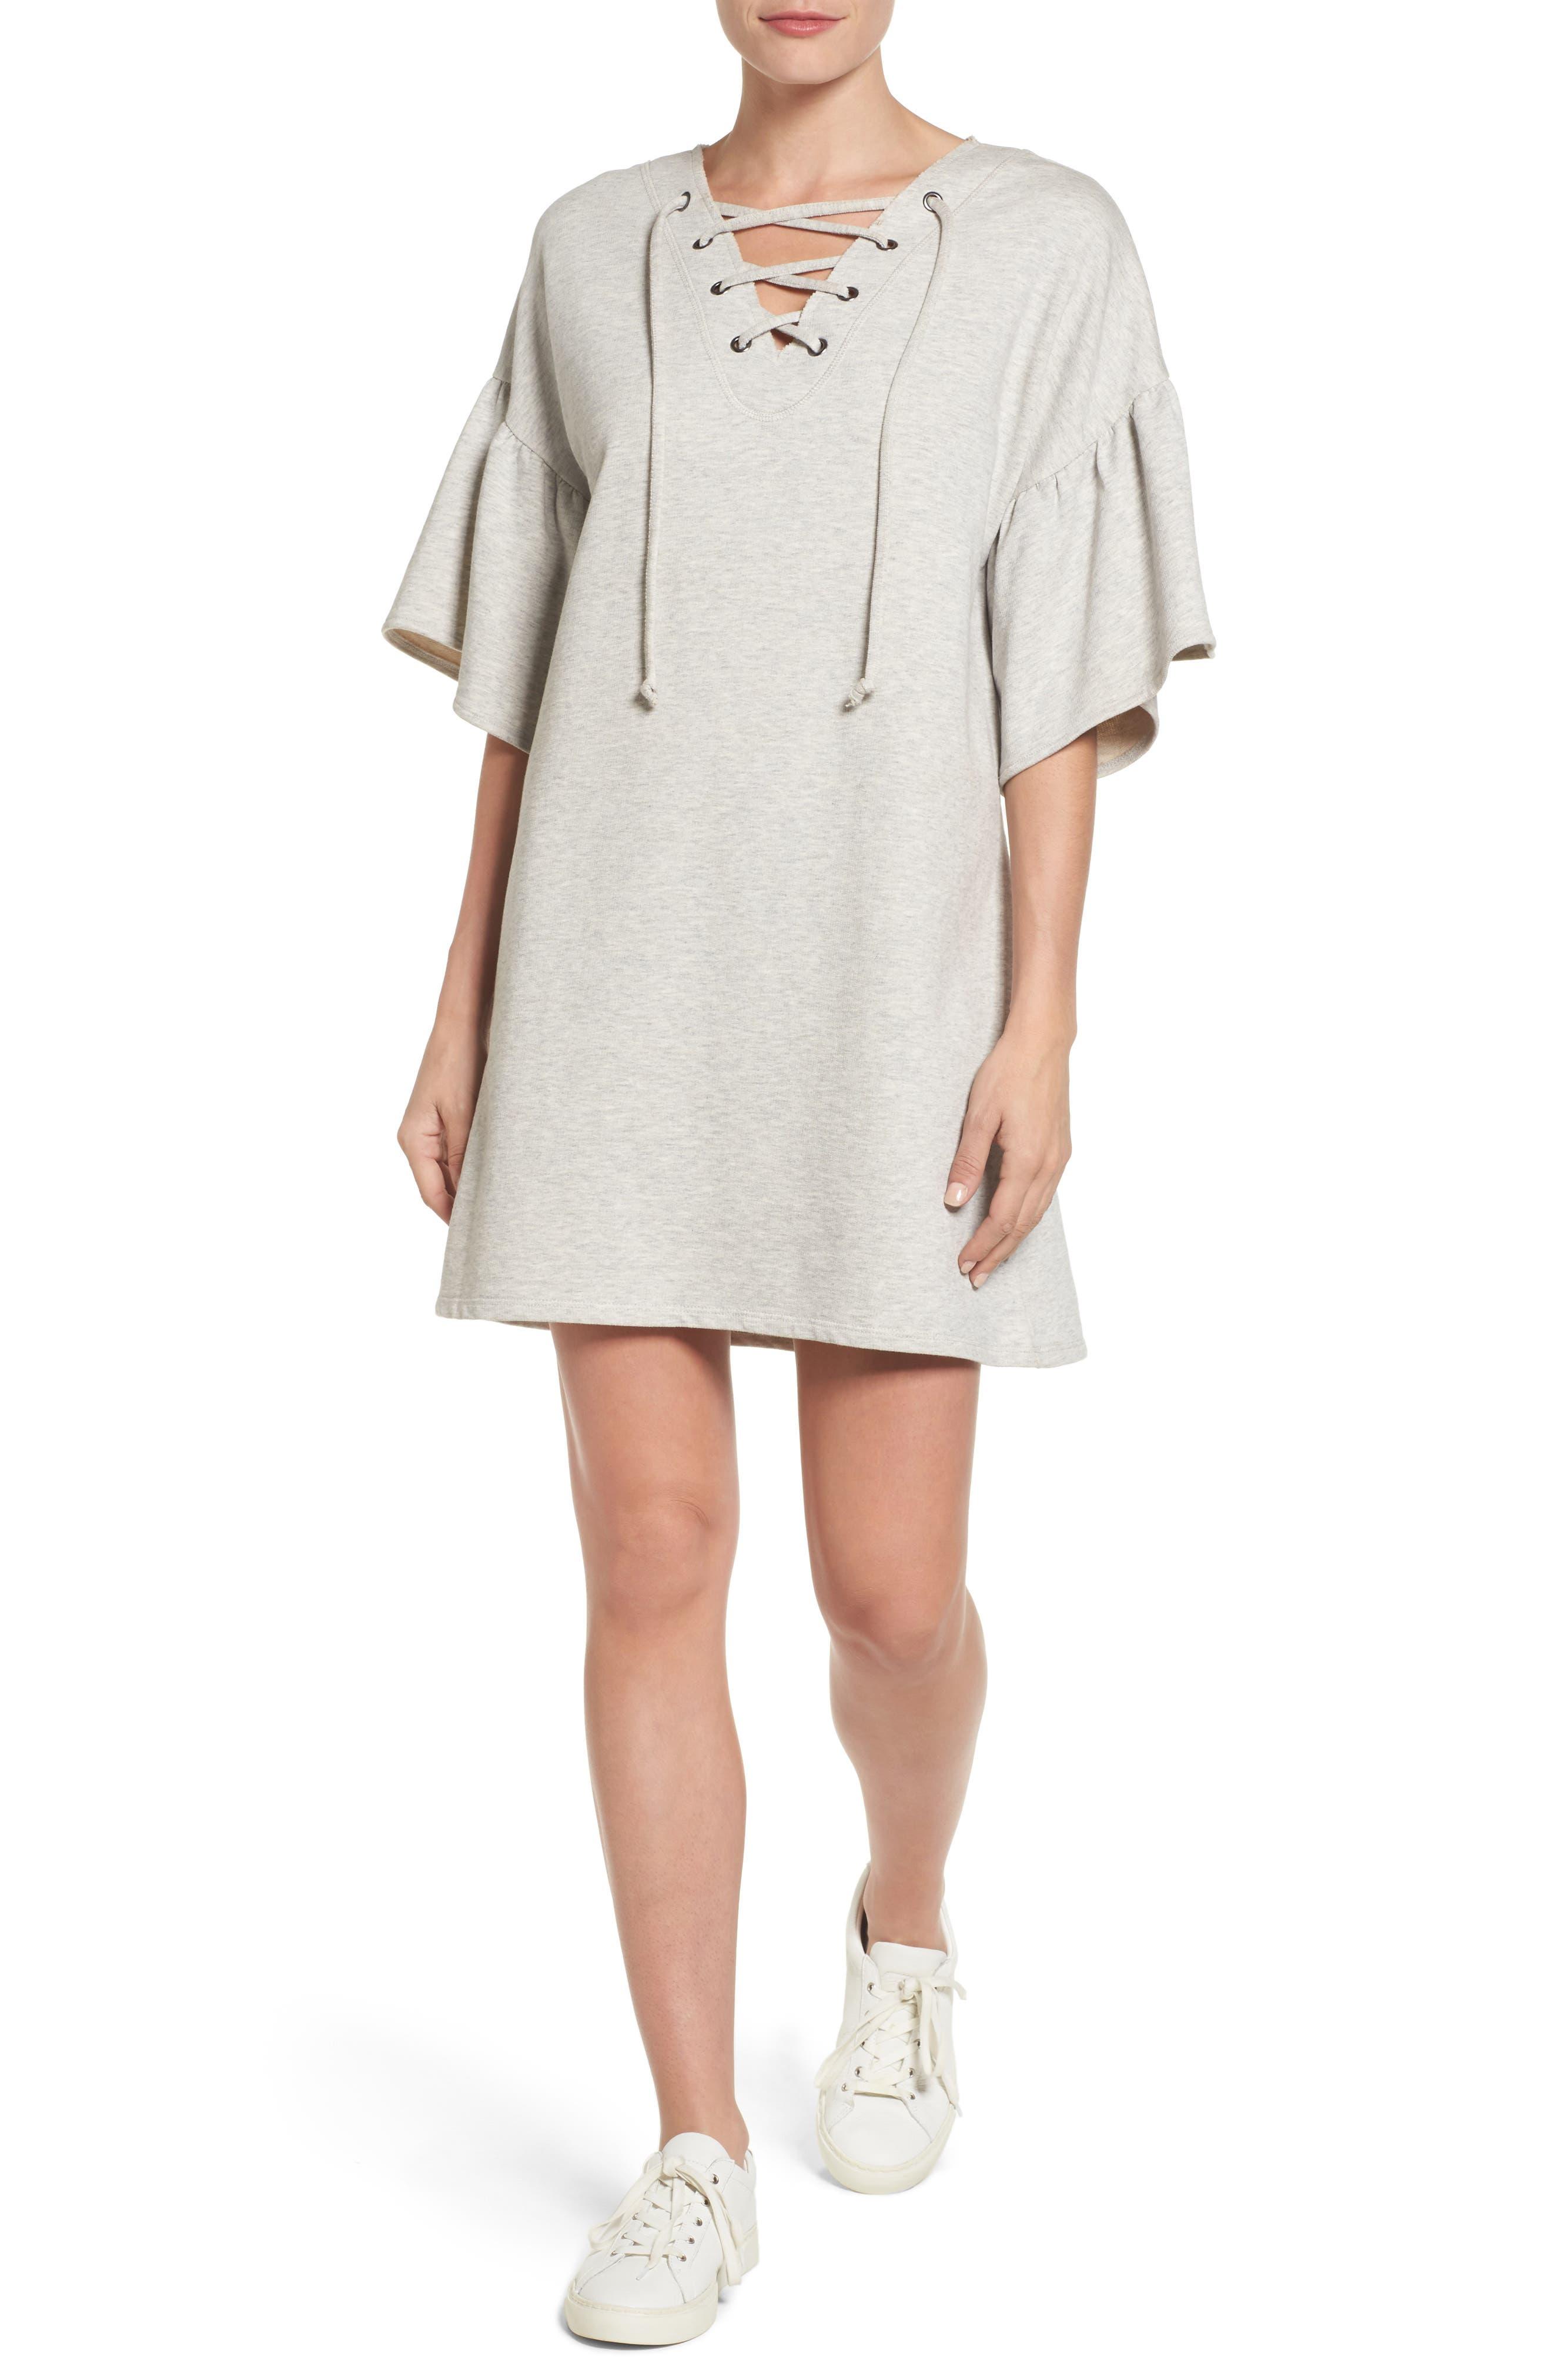 Mariska Fleece Knit Dress,                             Main thumbnail 1, color,                             Heather Sterling